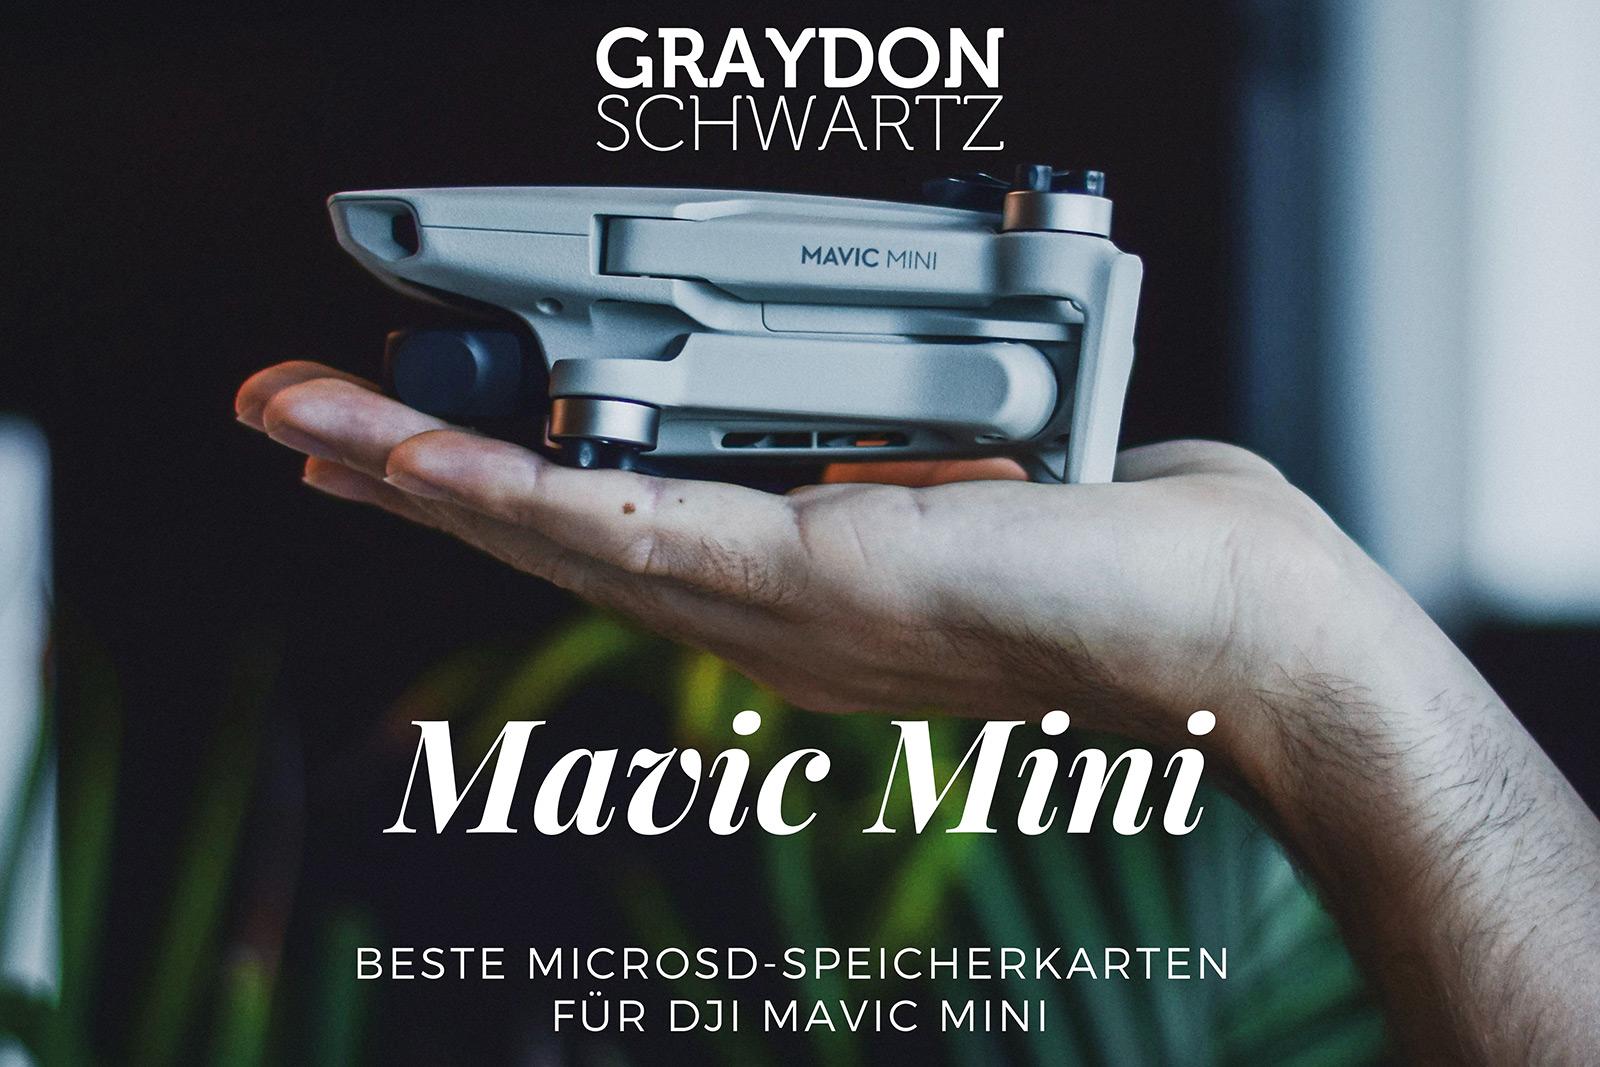 Beste MicroSD-Speicherkarten für DJI Mavic Mini